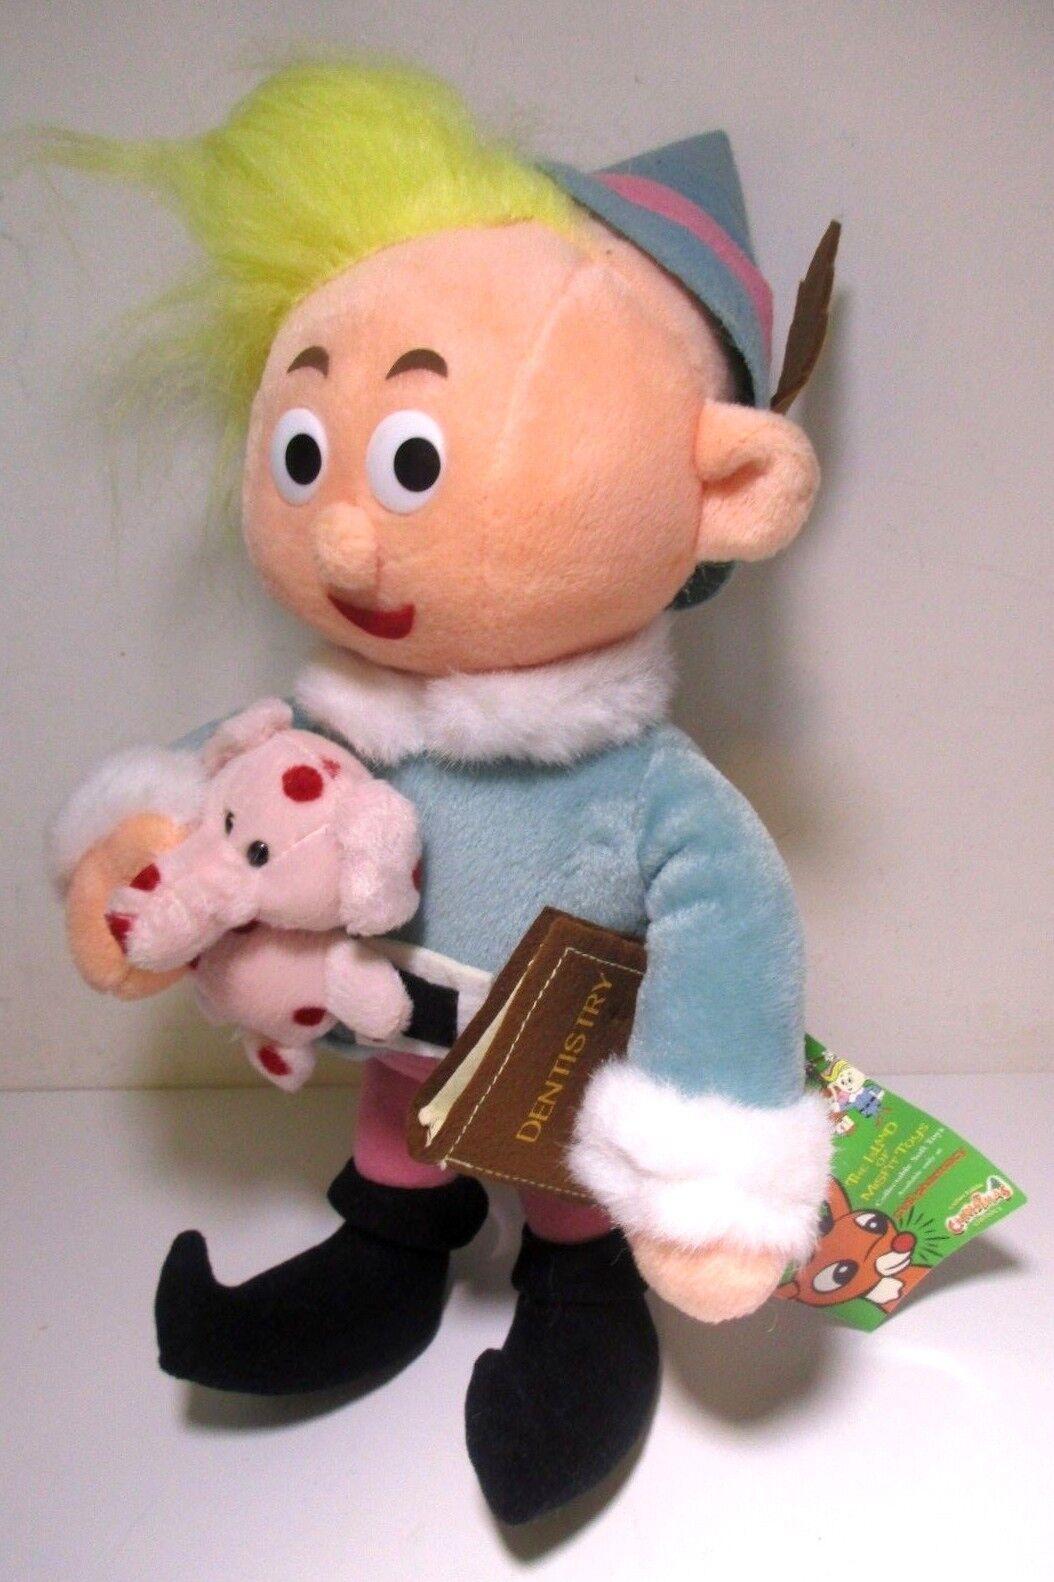 12  CVS Stuffins Rudolph Island Misfit De Peluche Juguete Muñeca Herbie The Elf